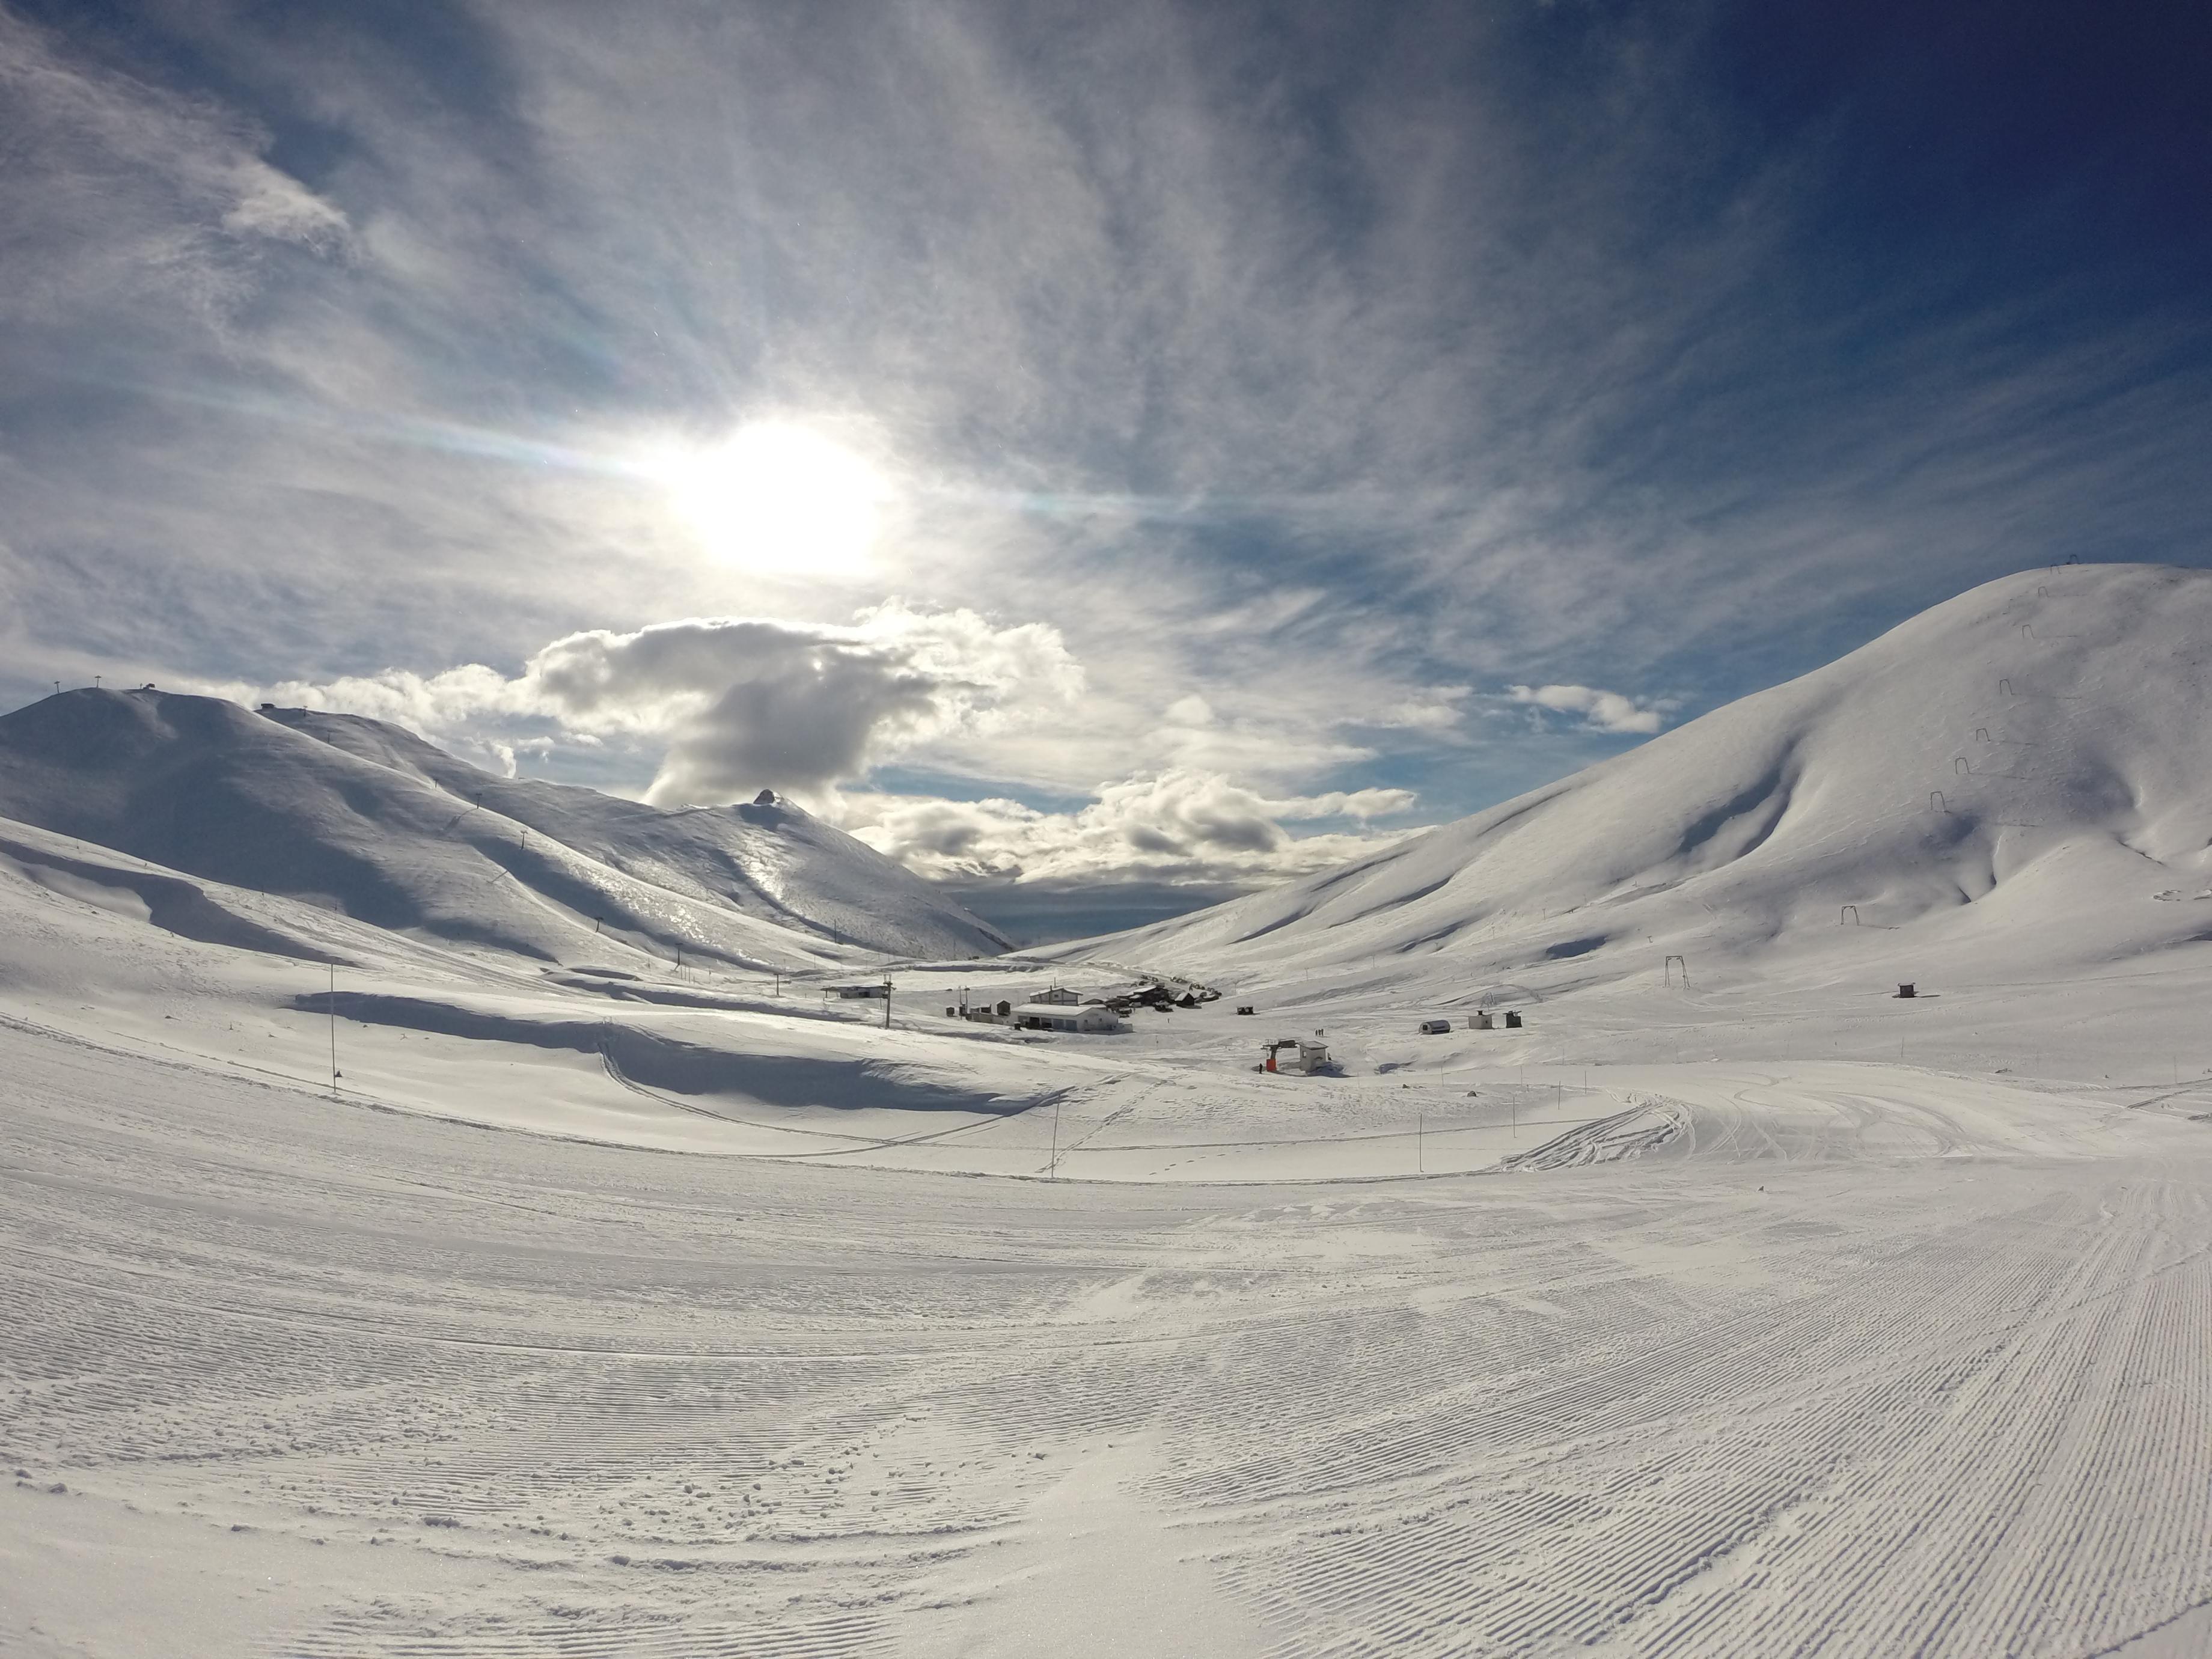 Falakro 3 day of the year 2015, Falakro Ski Resort